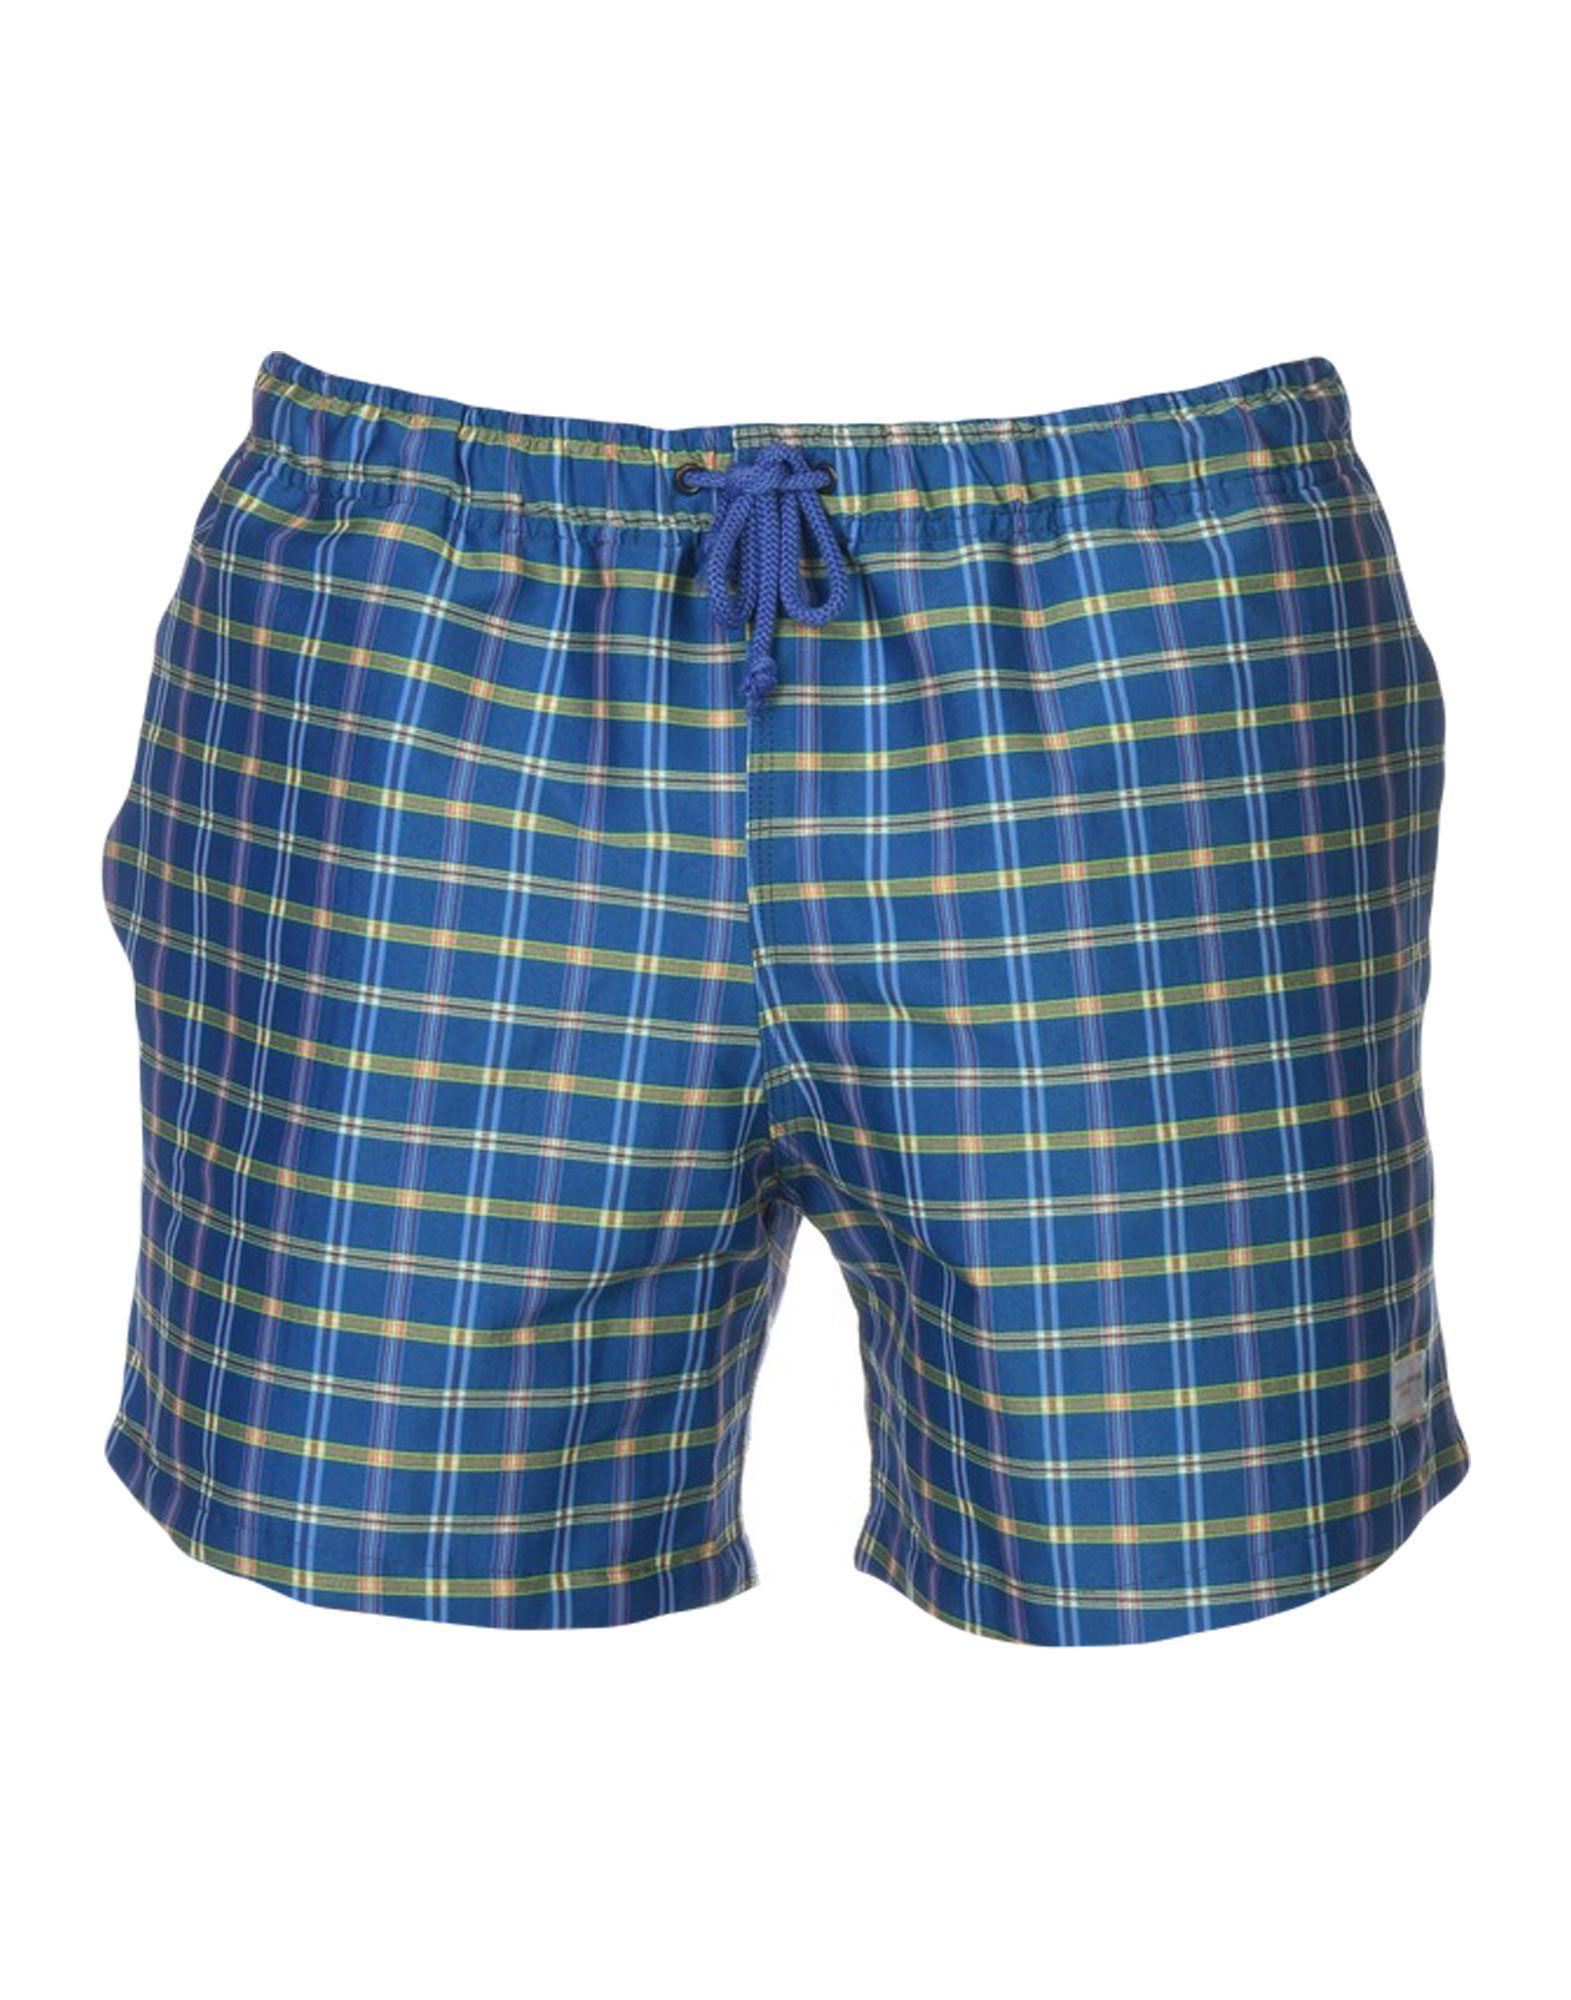 PRIMO EMPORIO Шорты для плавания ean13 футболка от ean13 54657